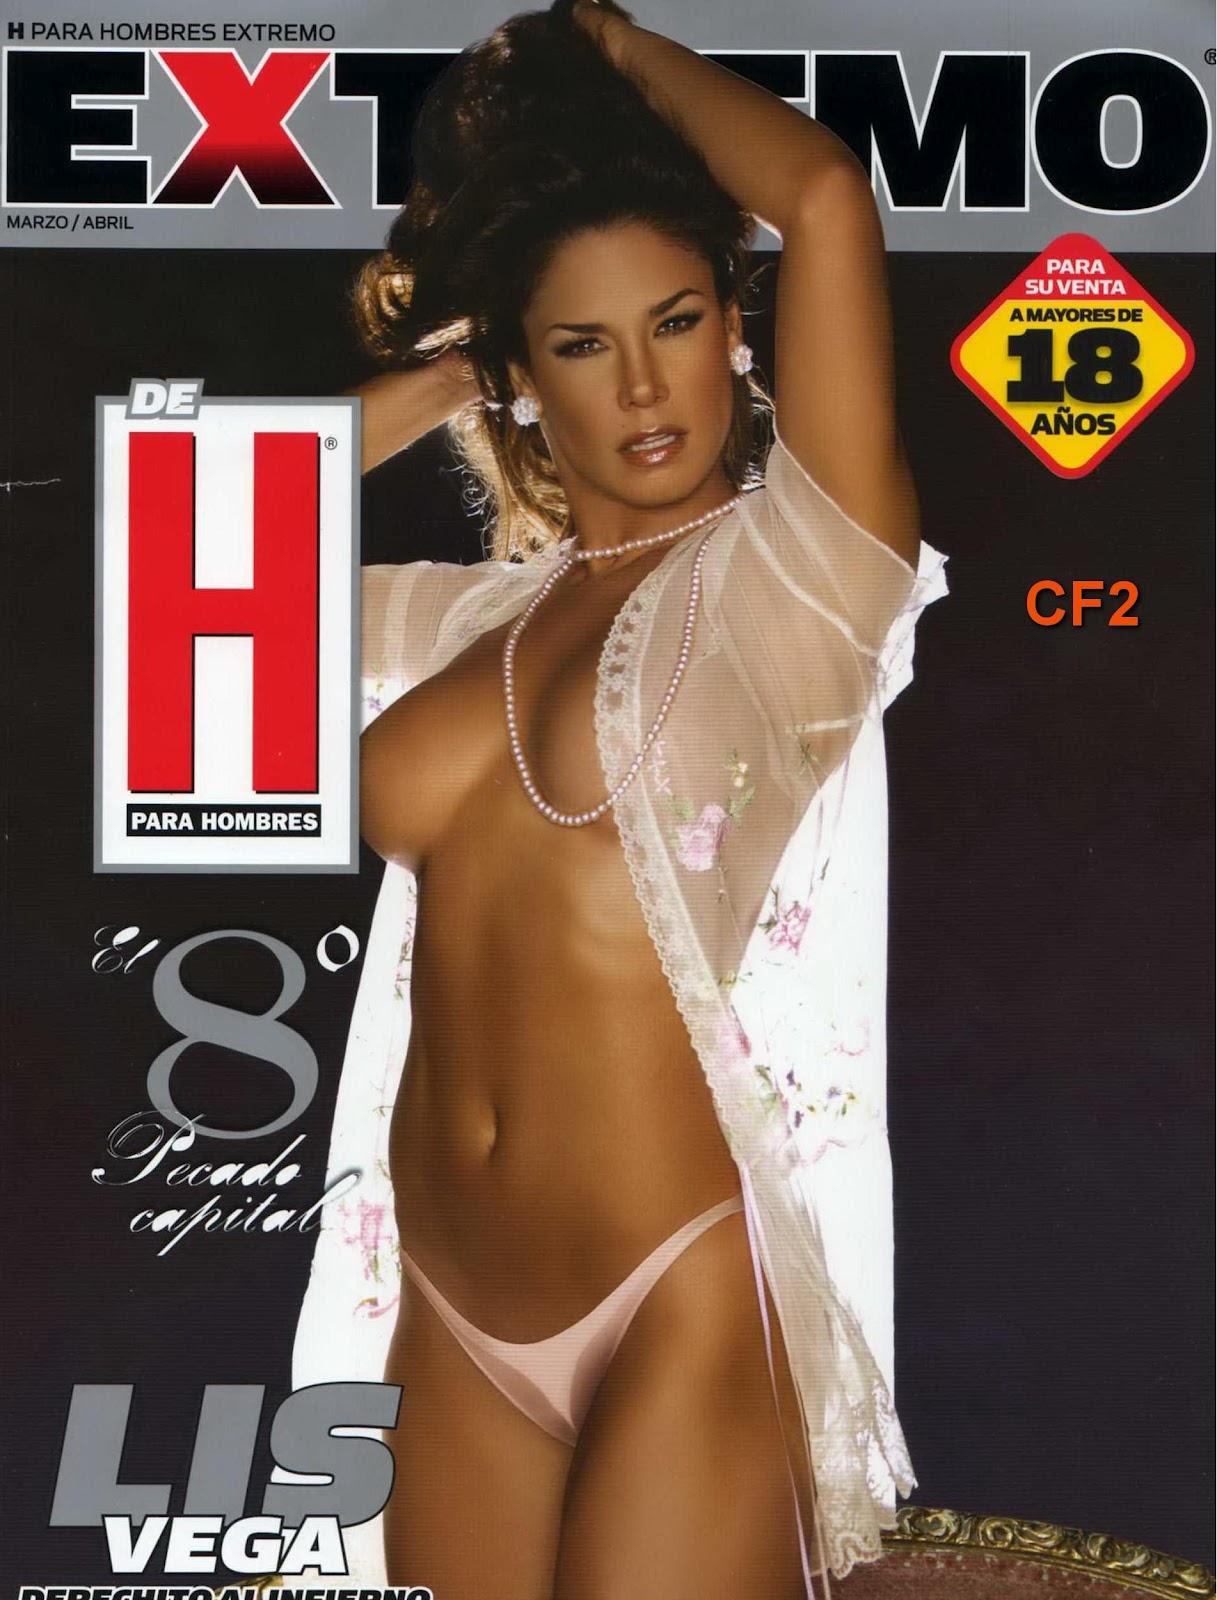 Lis Vega Revista H Etremo